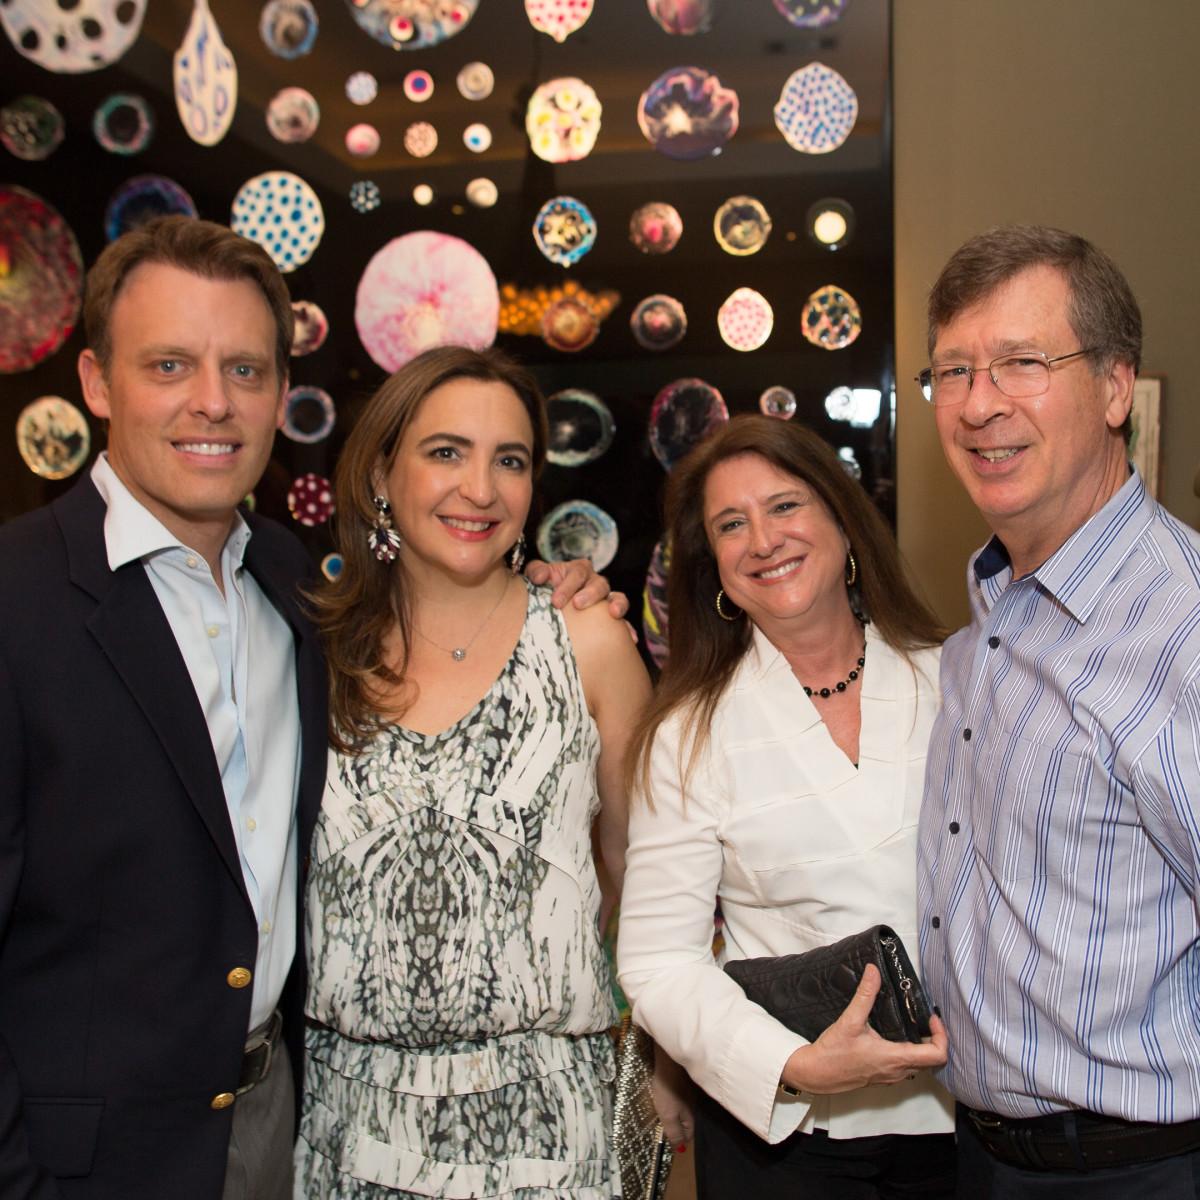 News, Shelby, Fine Art Fair Kick-off, Sept. 2015, Arturo Creixell, Paola Creixell, Deborah Colton, Bill Colton